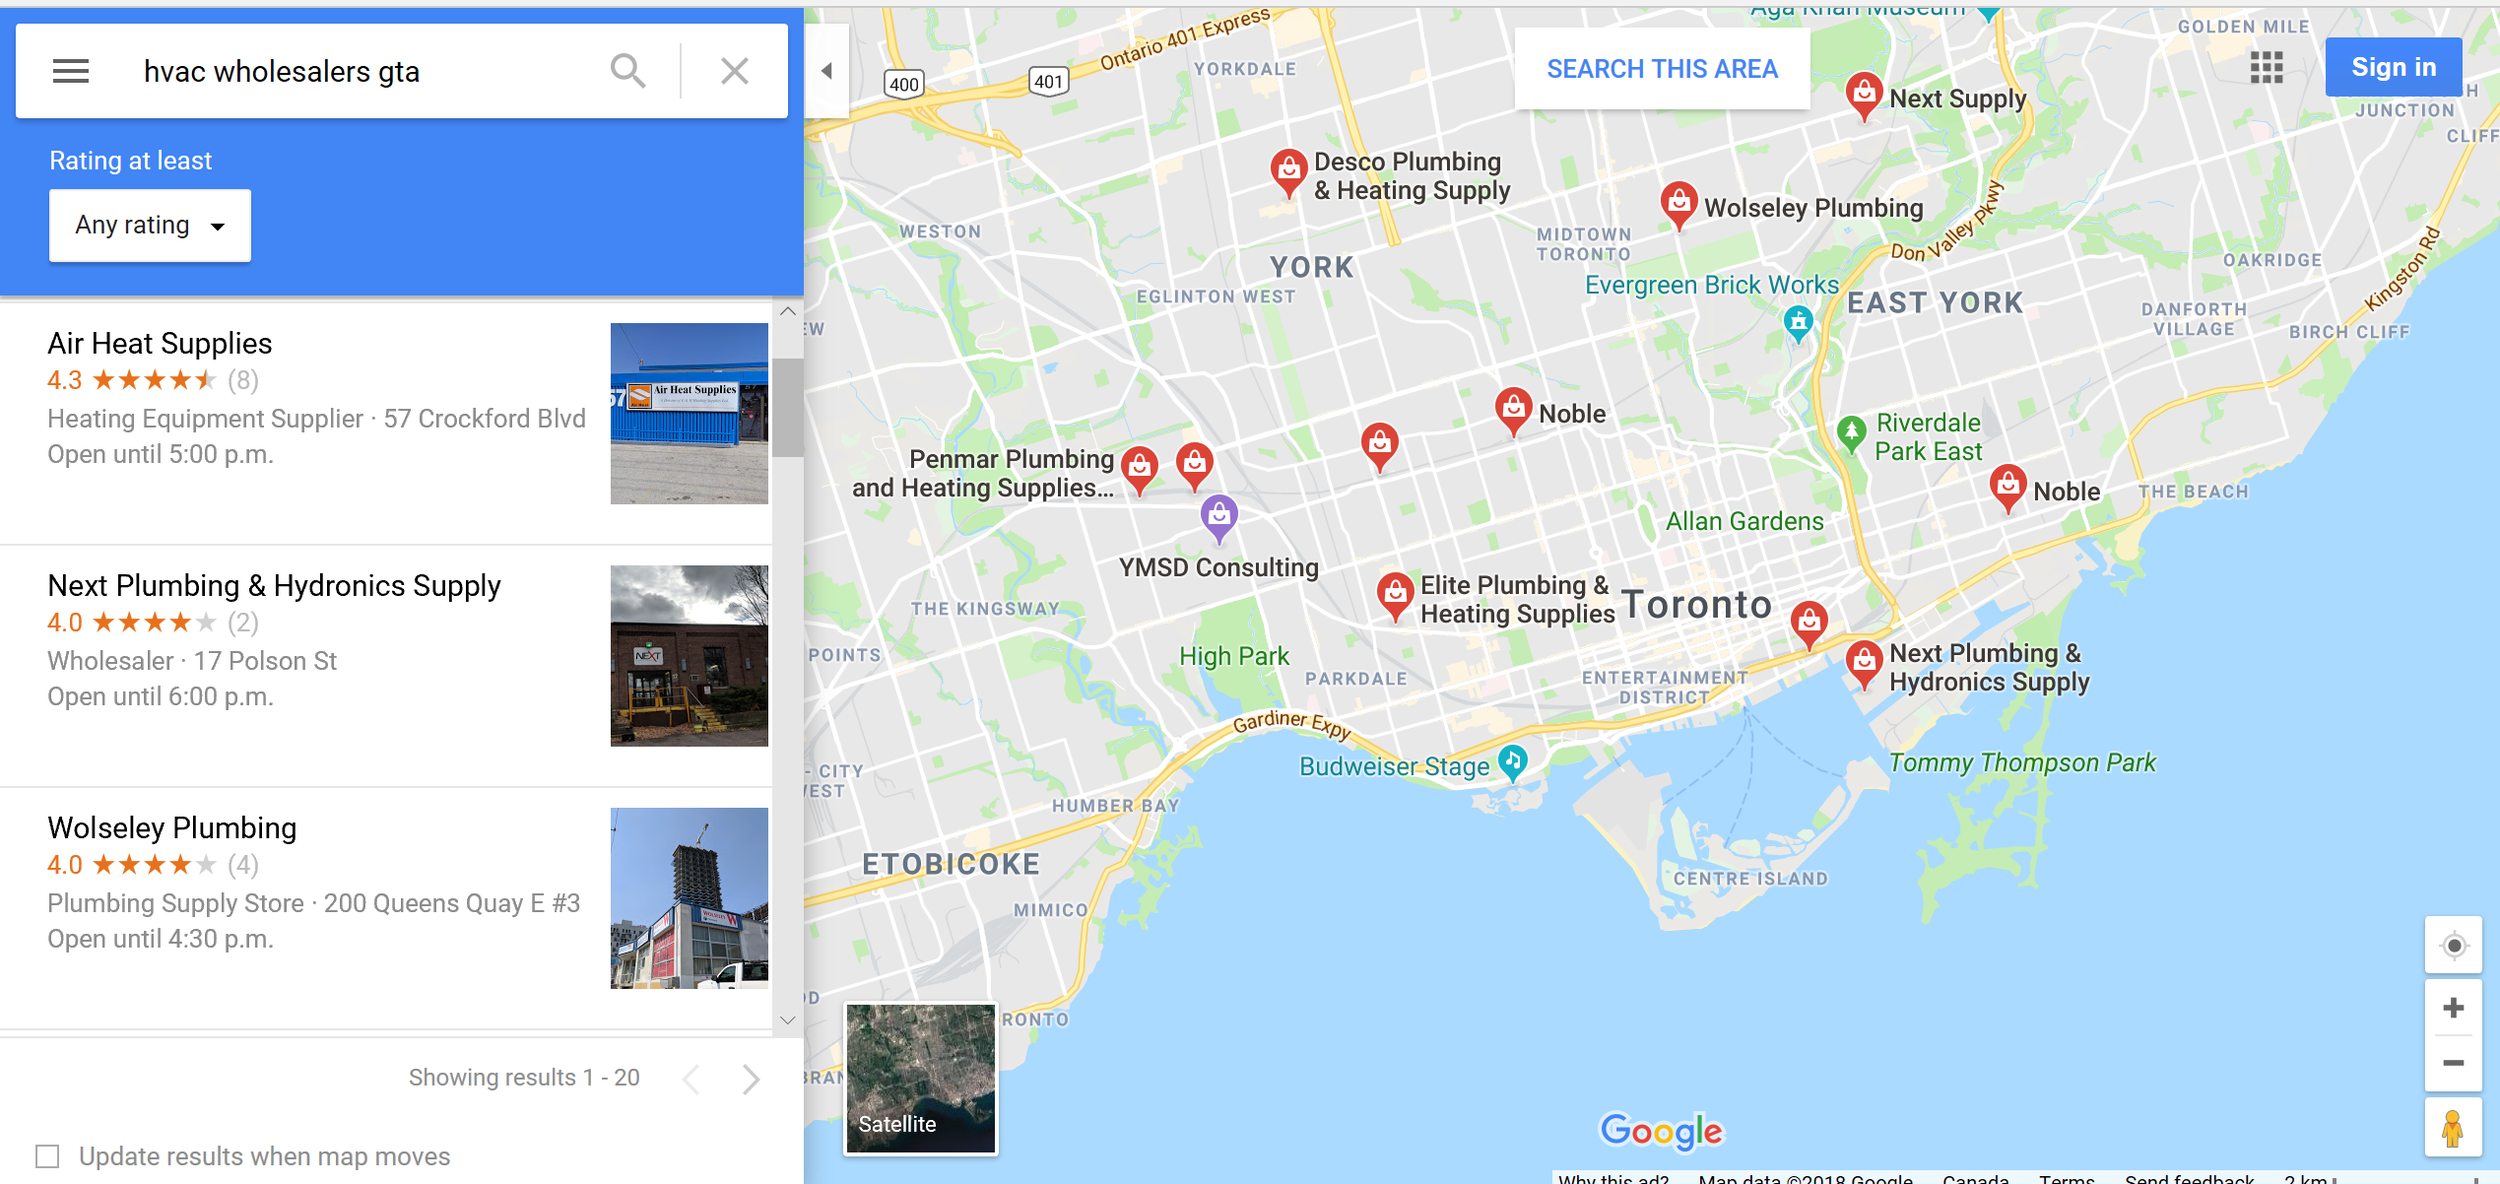 hvac_wholesalers_GTA_google_maps_search